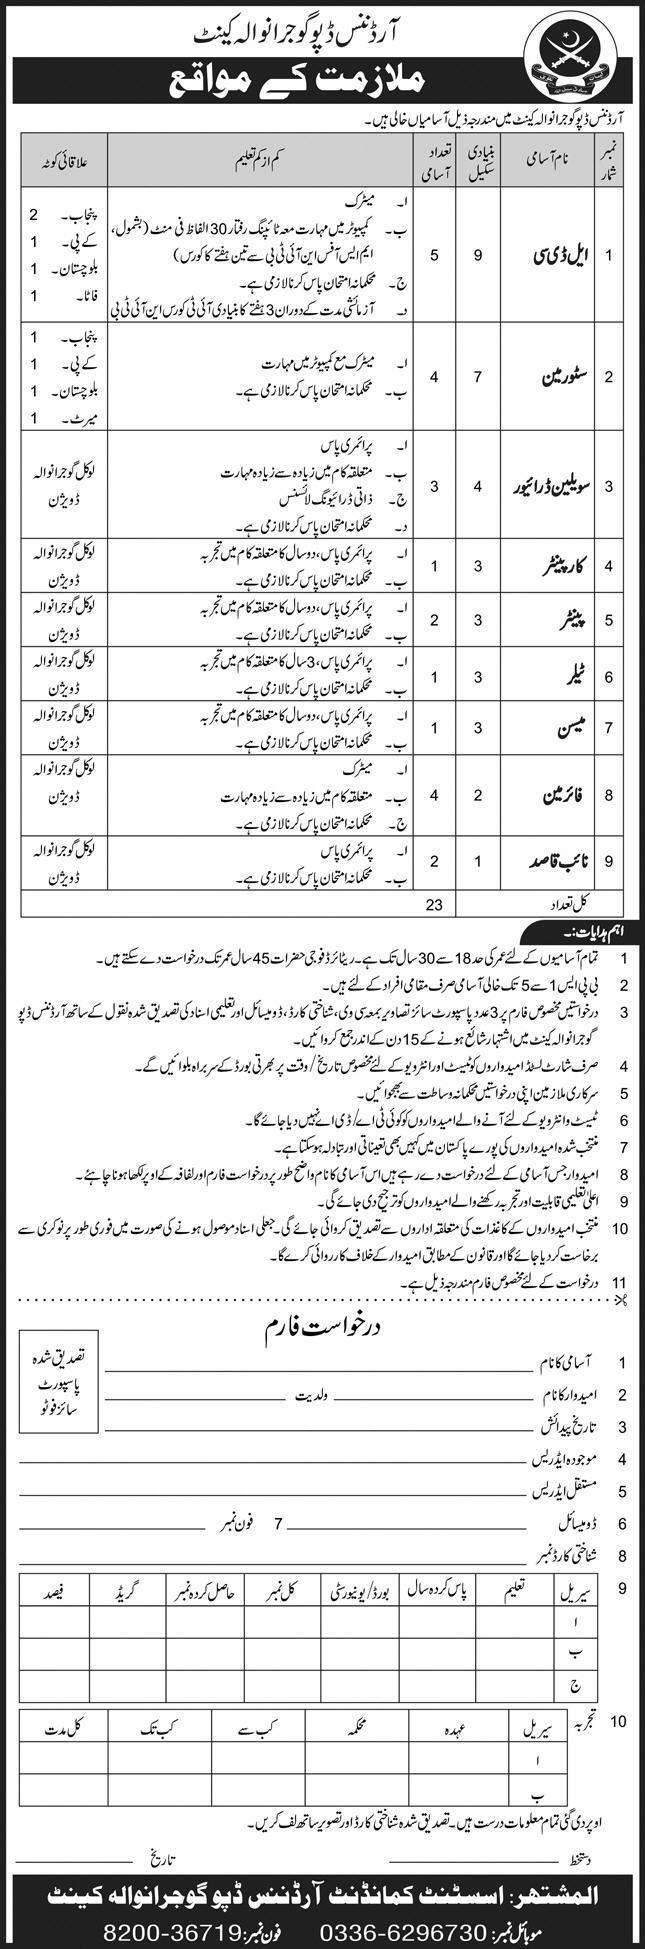 join-pak-army-ordanace-depot-jobs-2020